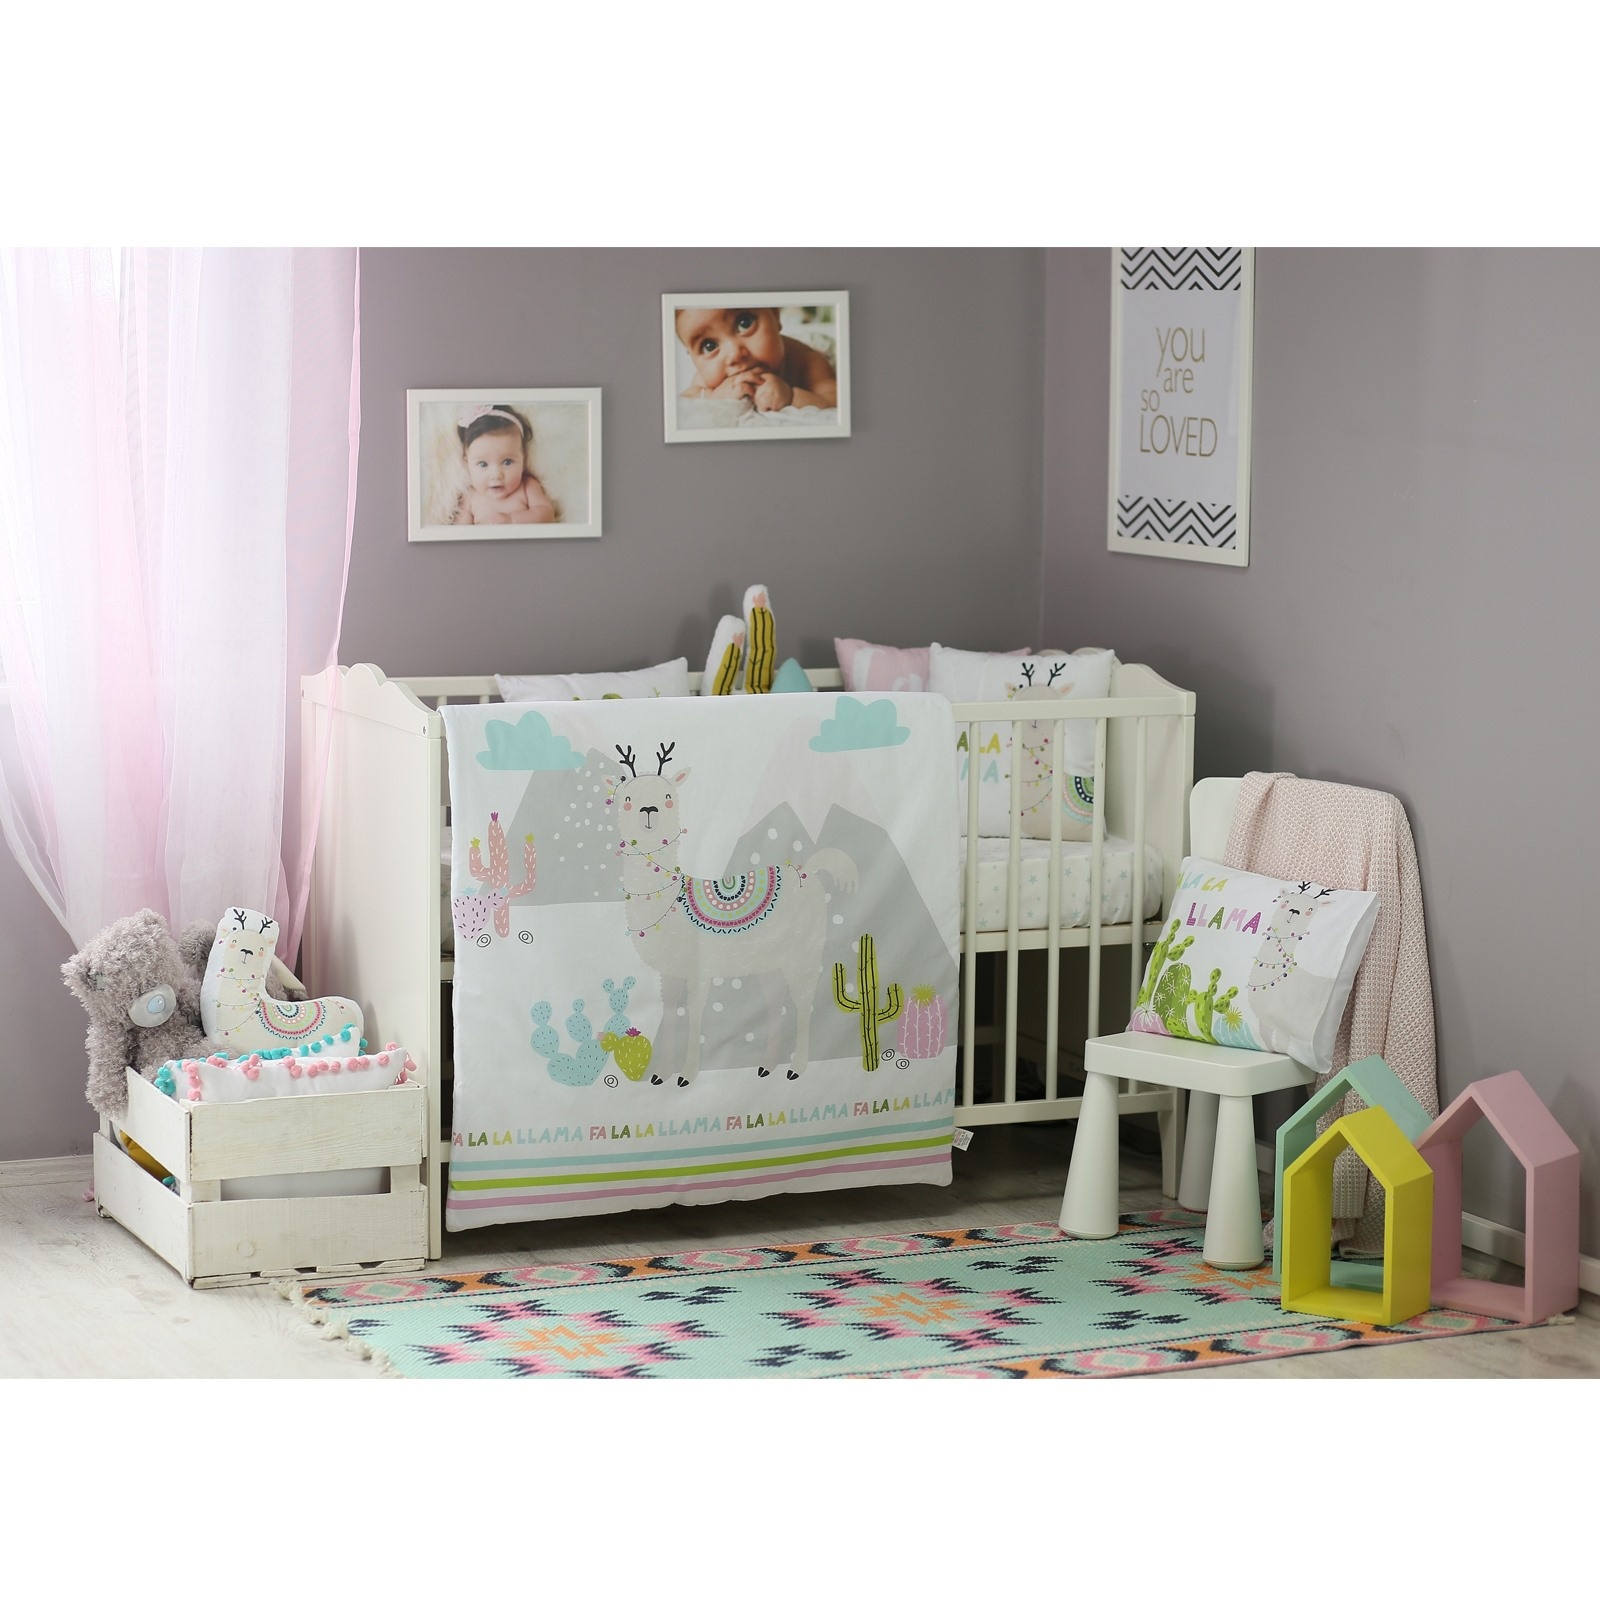 Ebebek Apolena Baby Llama Bed Filled Duvet Cover 80x100 Cm